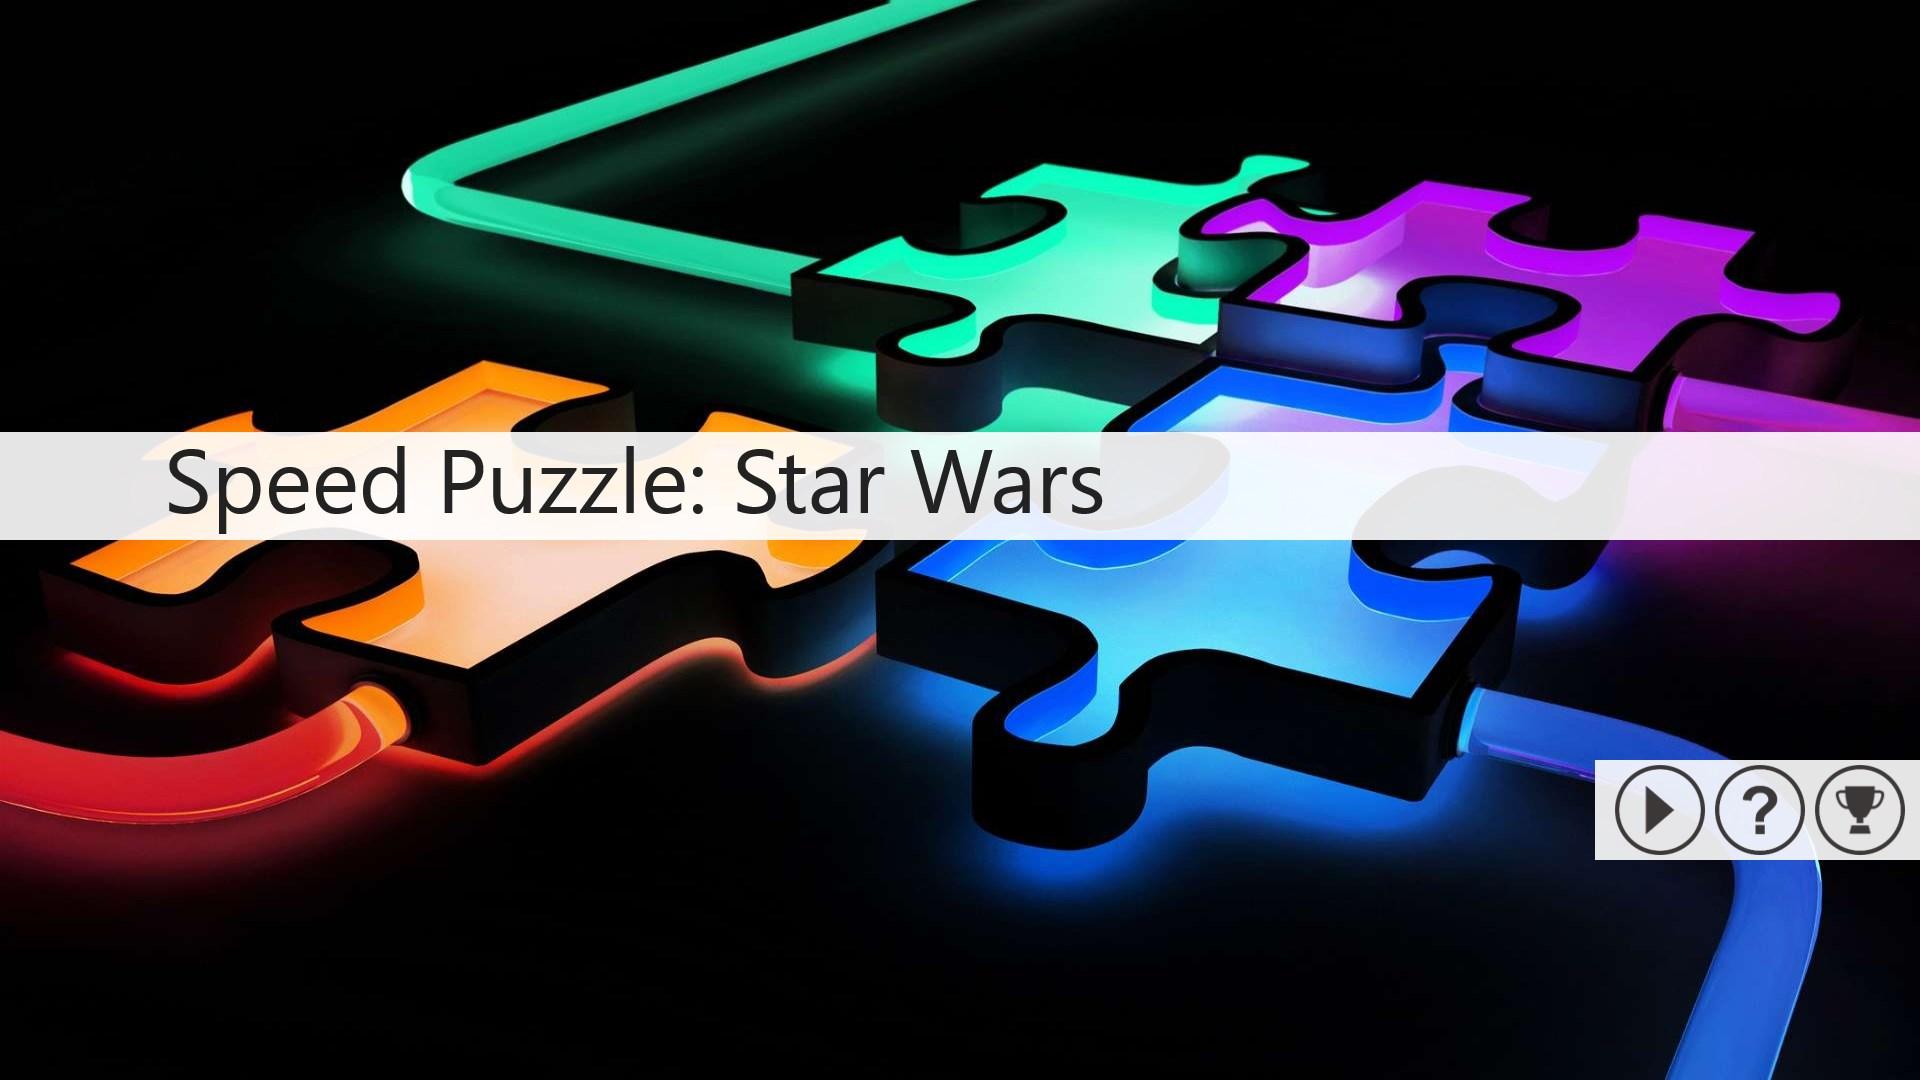 speed puzzle star wars for windows 10. Black Bedroom Furniture Sets. Home Design Ideas